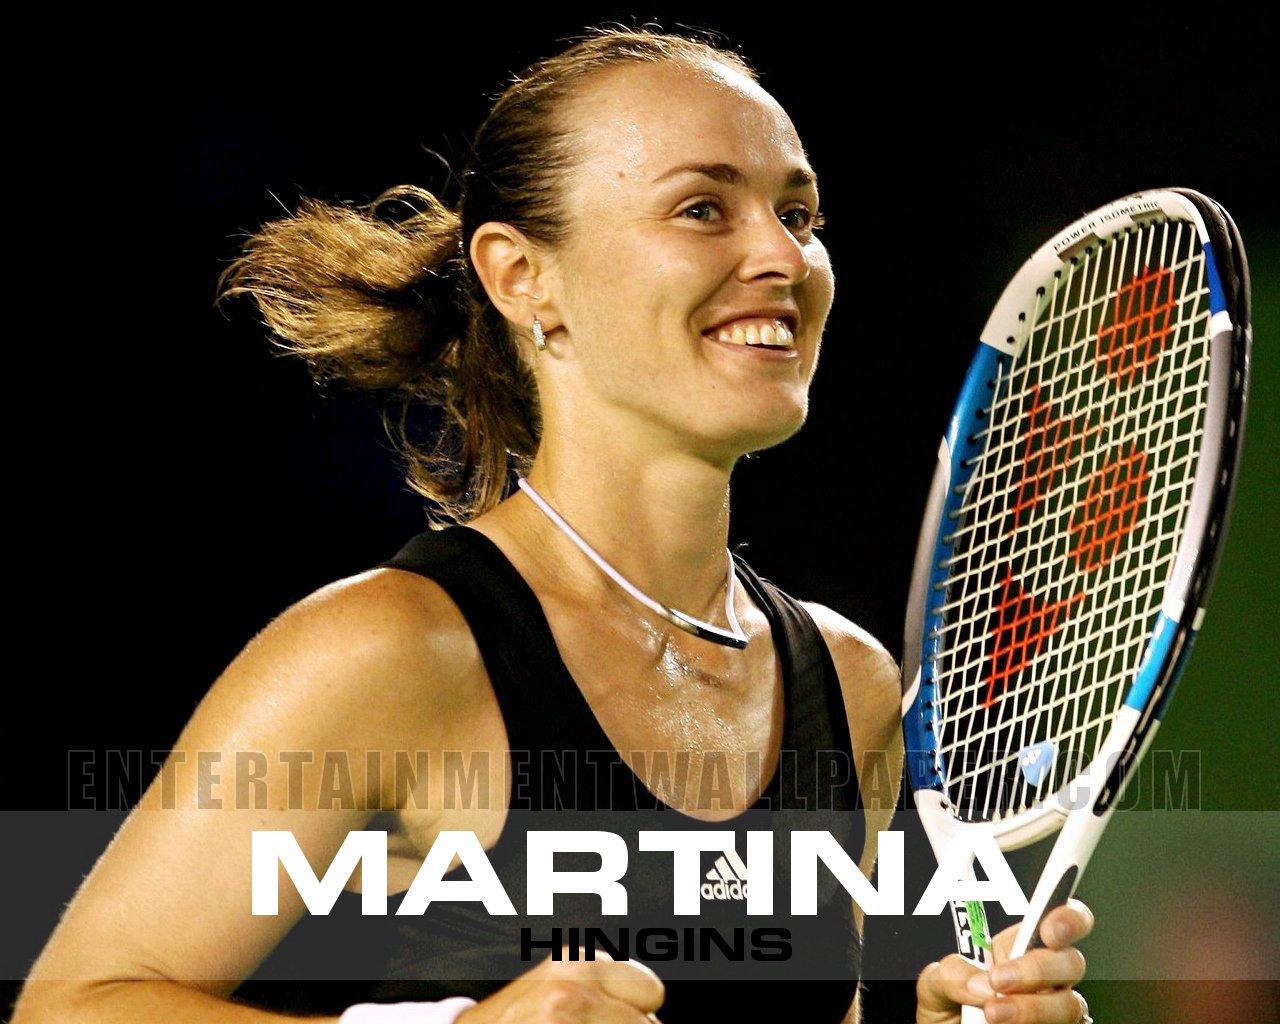 Martina Hingis Wallpaper 4   1280 X 1024 stmednet 1280x1024